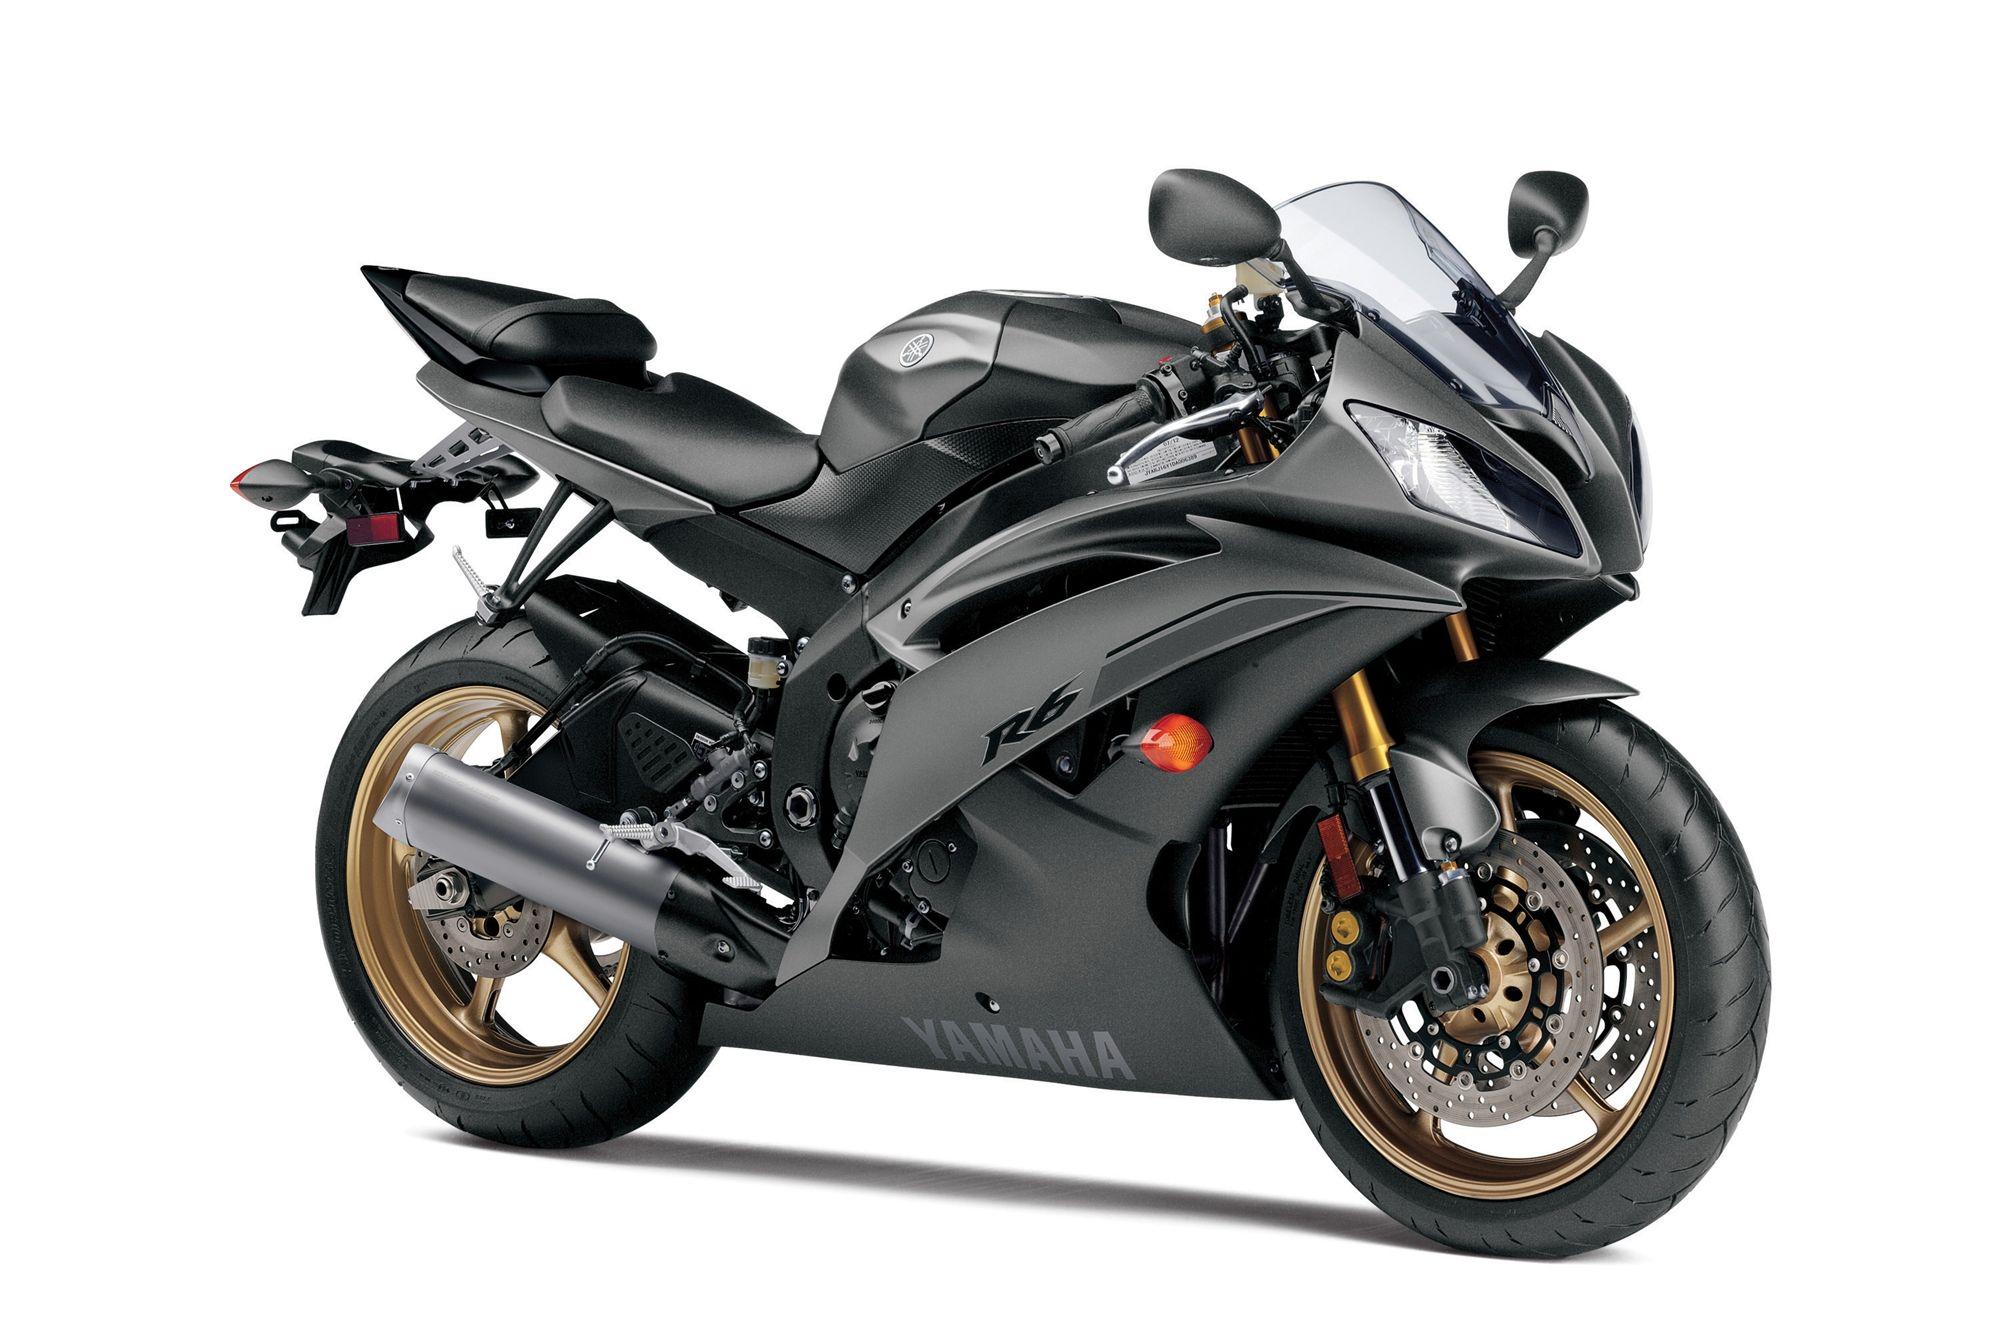 2014 Yzf R6 Motorcycle Template R6 Motorcycle Yamaha Yzf R6 Yamaha R6 Black